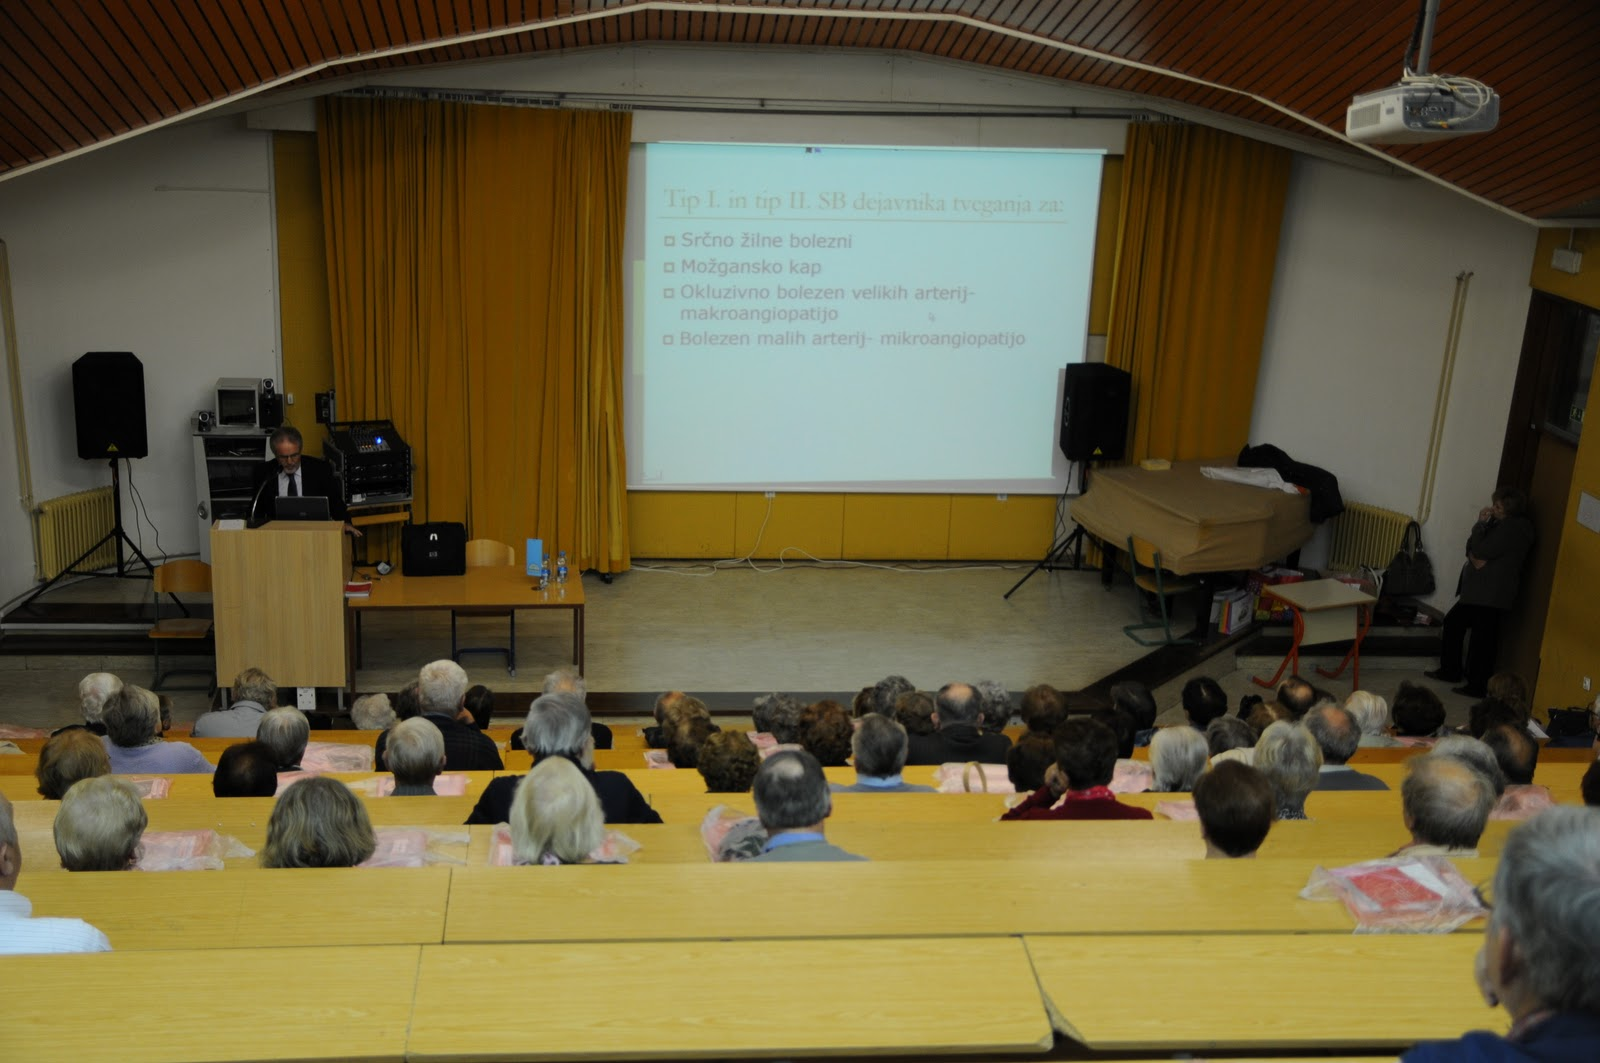 Predavanje, dr. Camlek - oktober 2011 - DSC_3879.JPG